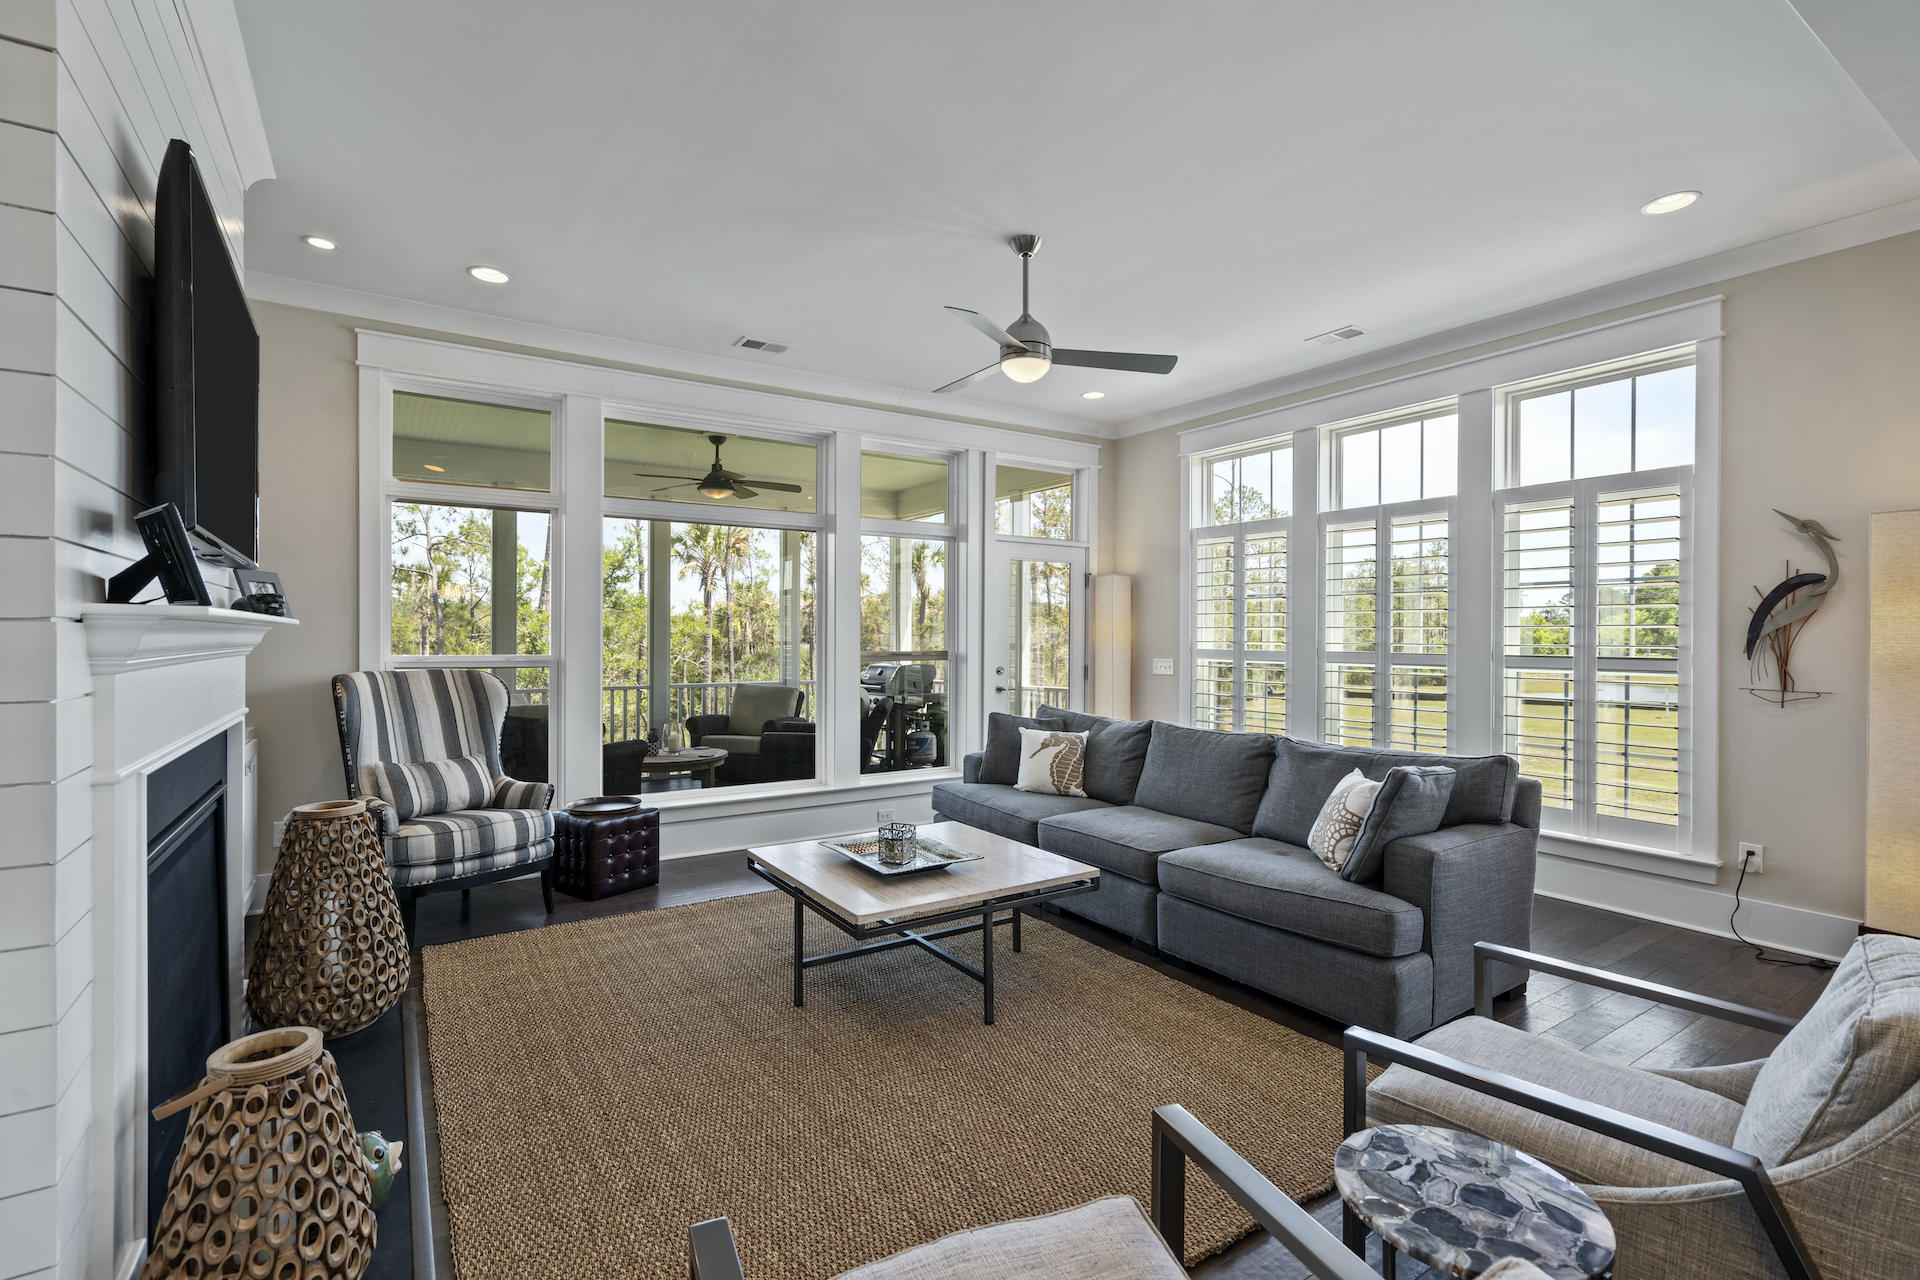 Dunes West Homes For Sale - 2316 Bucktail, Mount Pleasant, SC - 33